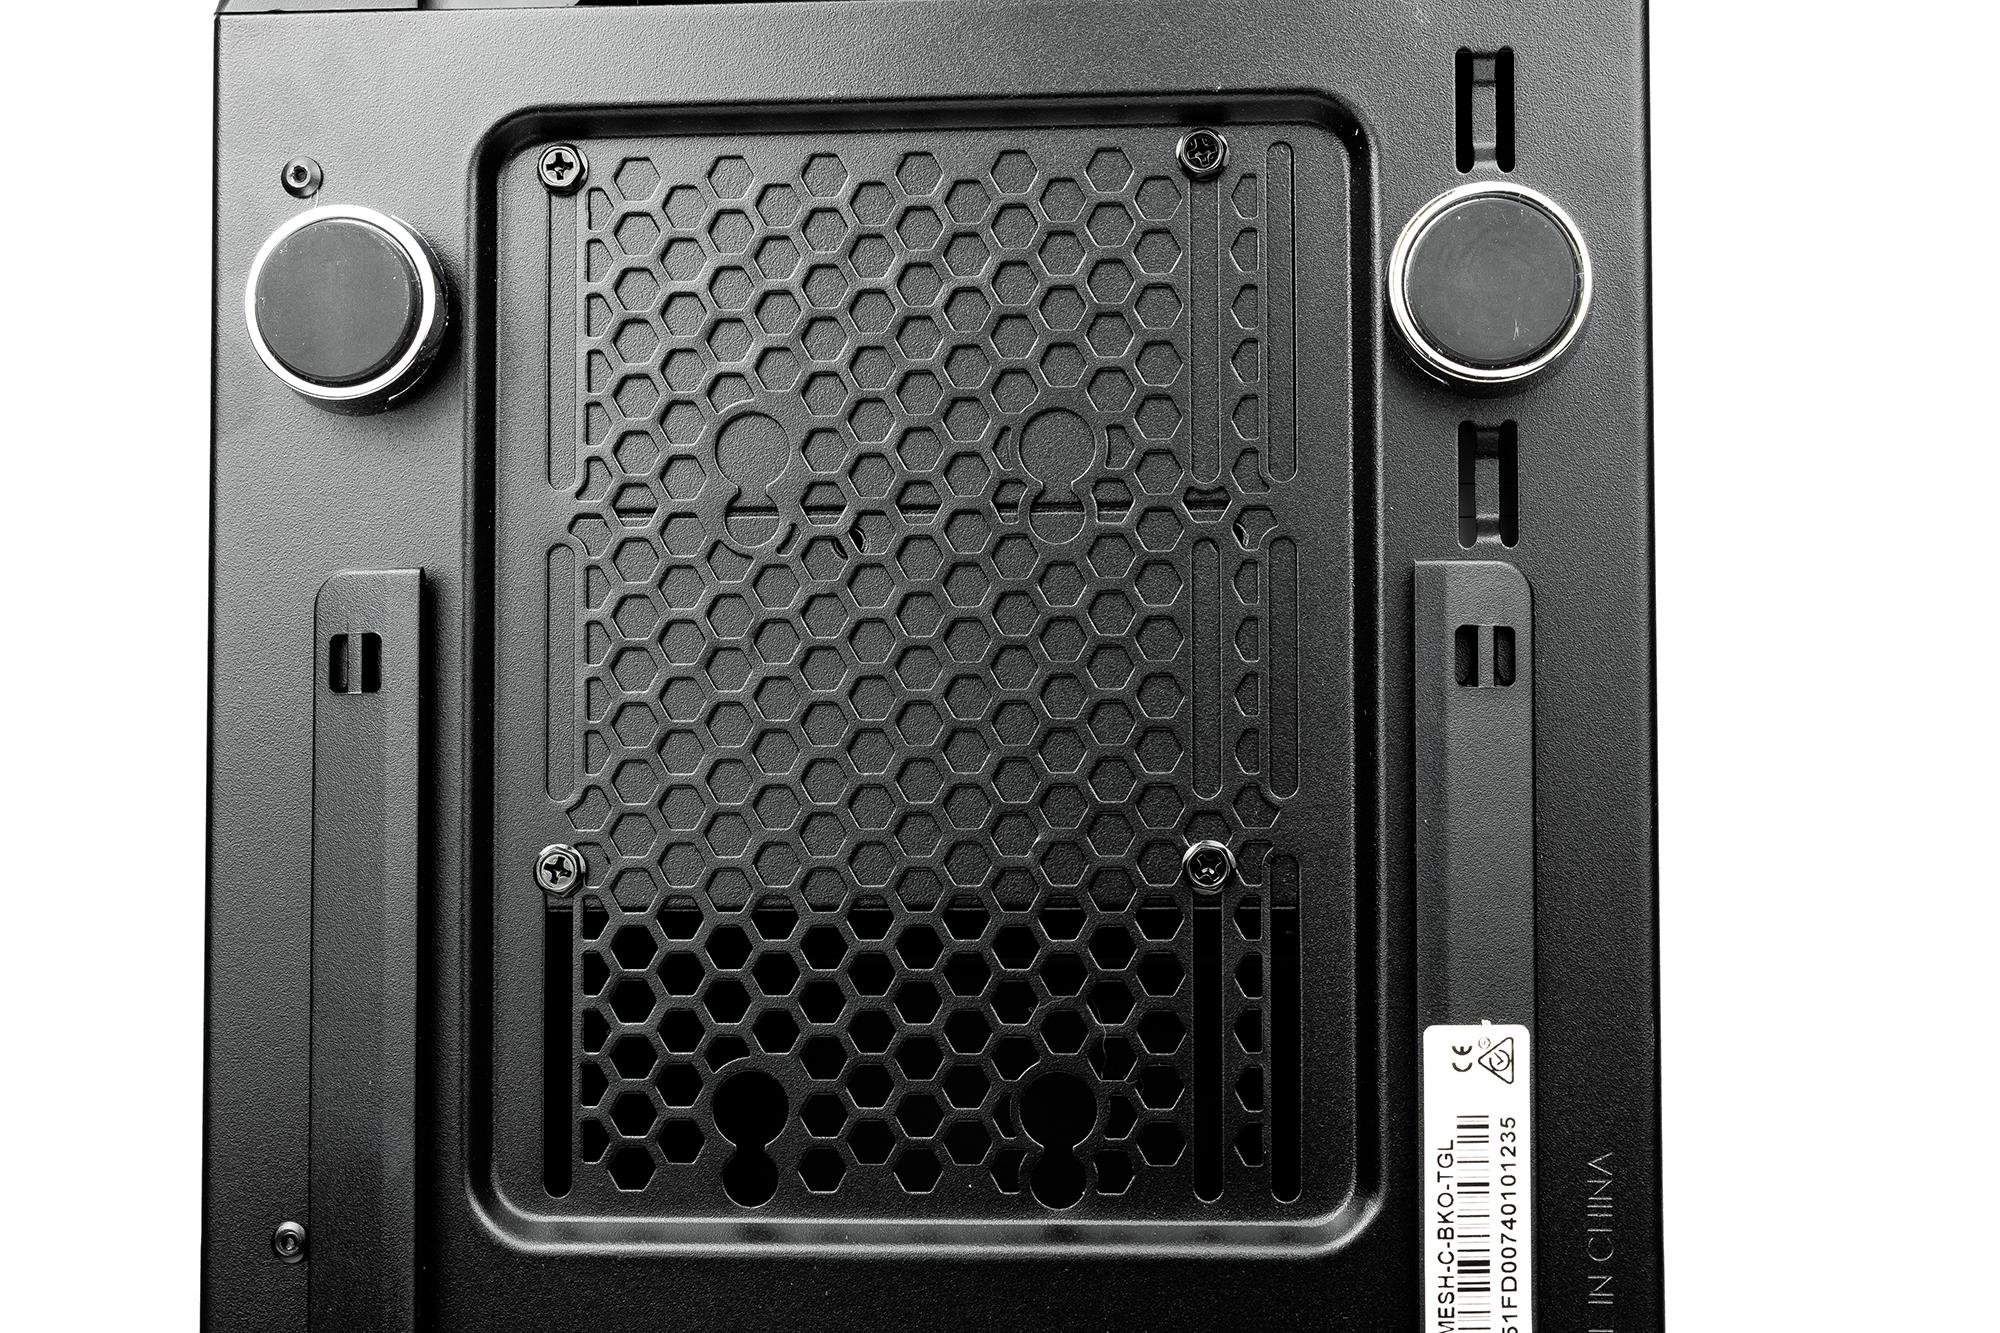 Leser-Test]Fractal Design Meshify C TG - Das Skandinavische ...